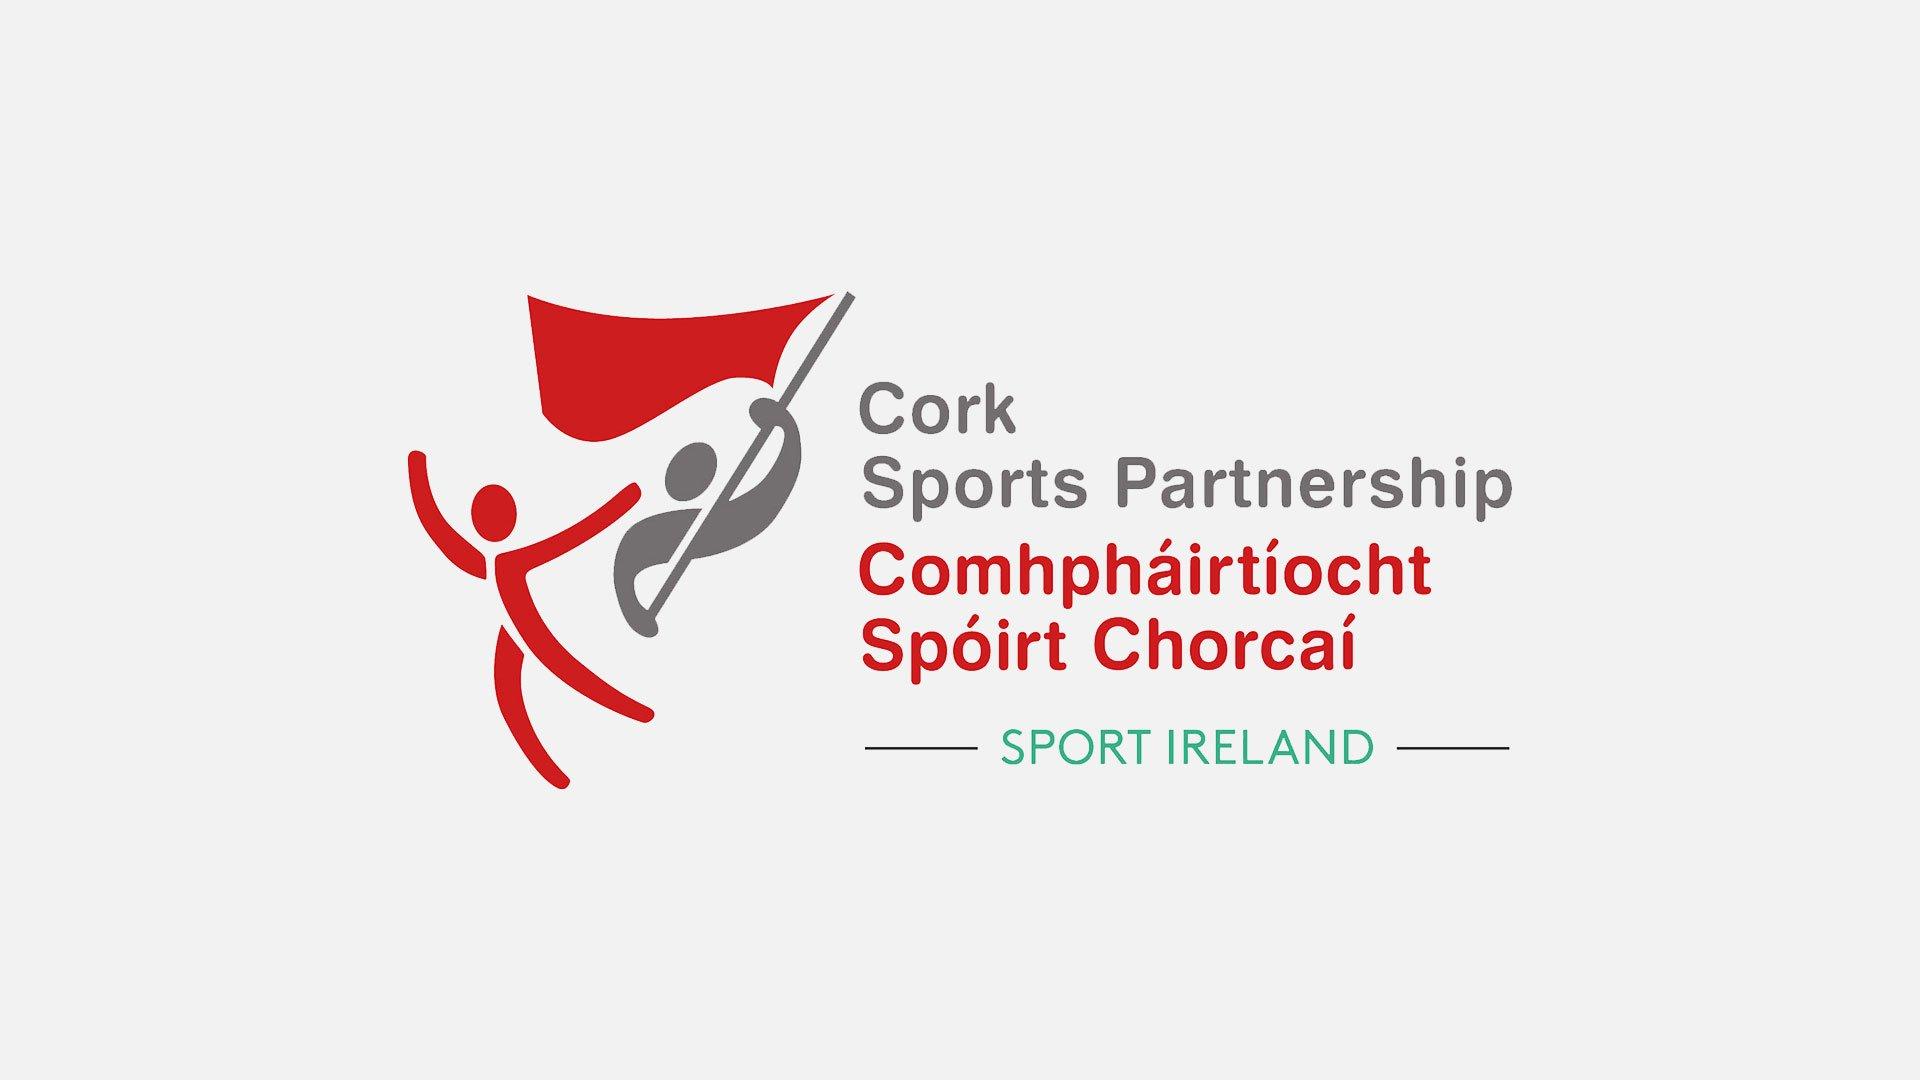 Cork Sports Partnership